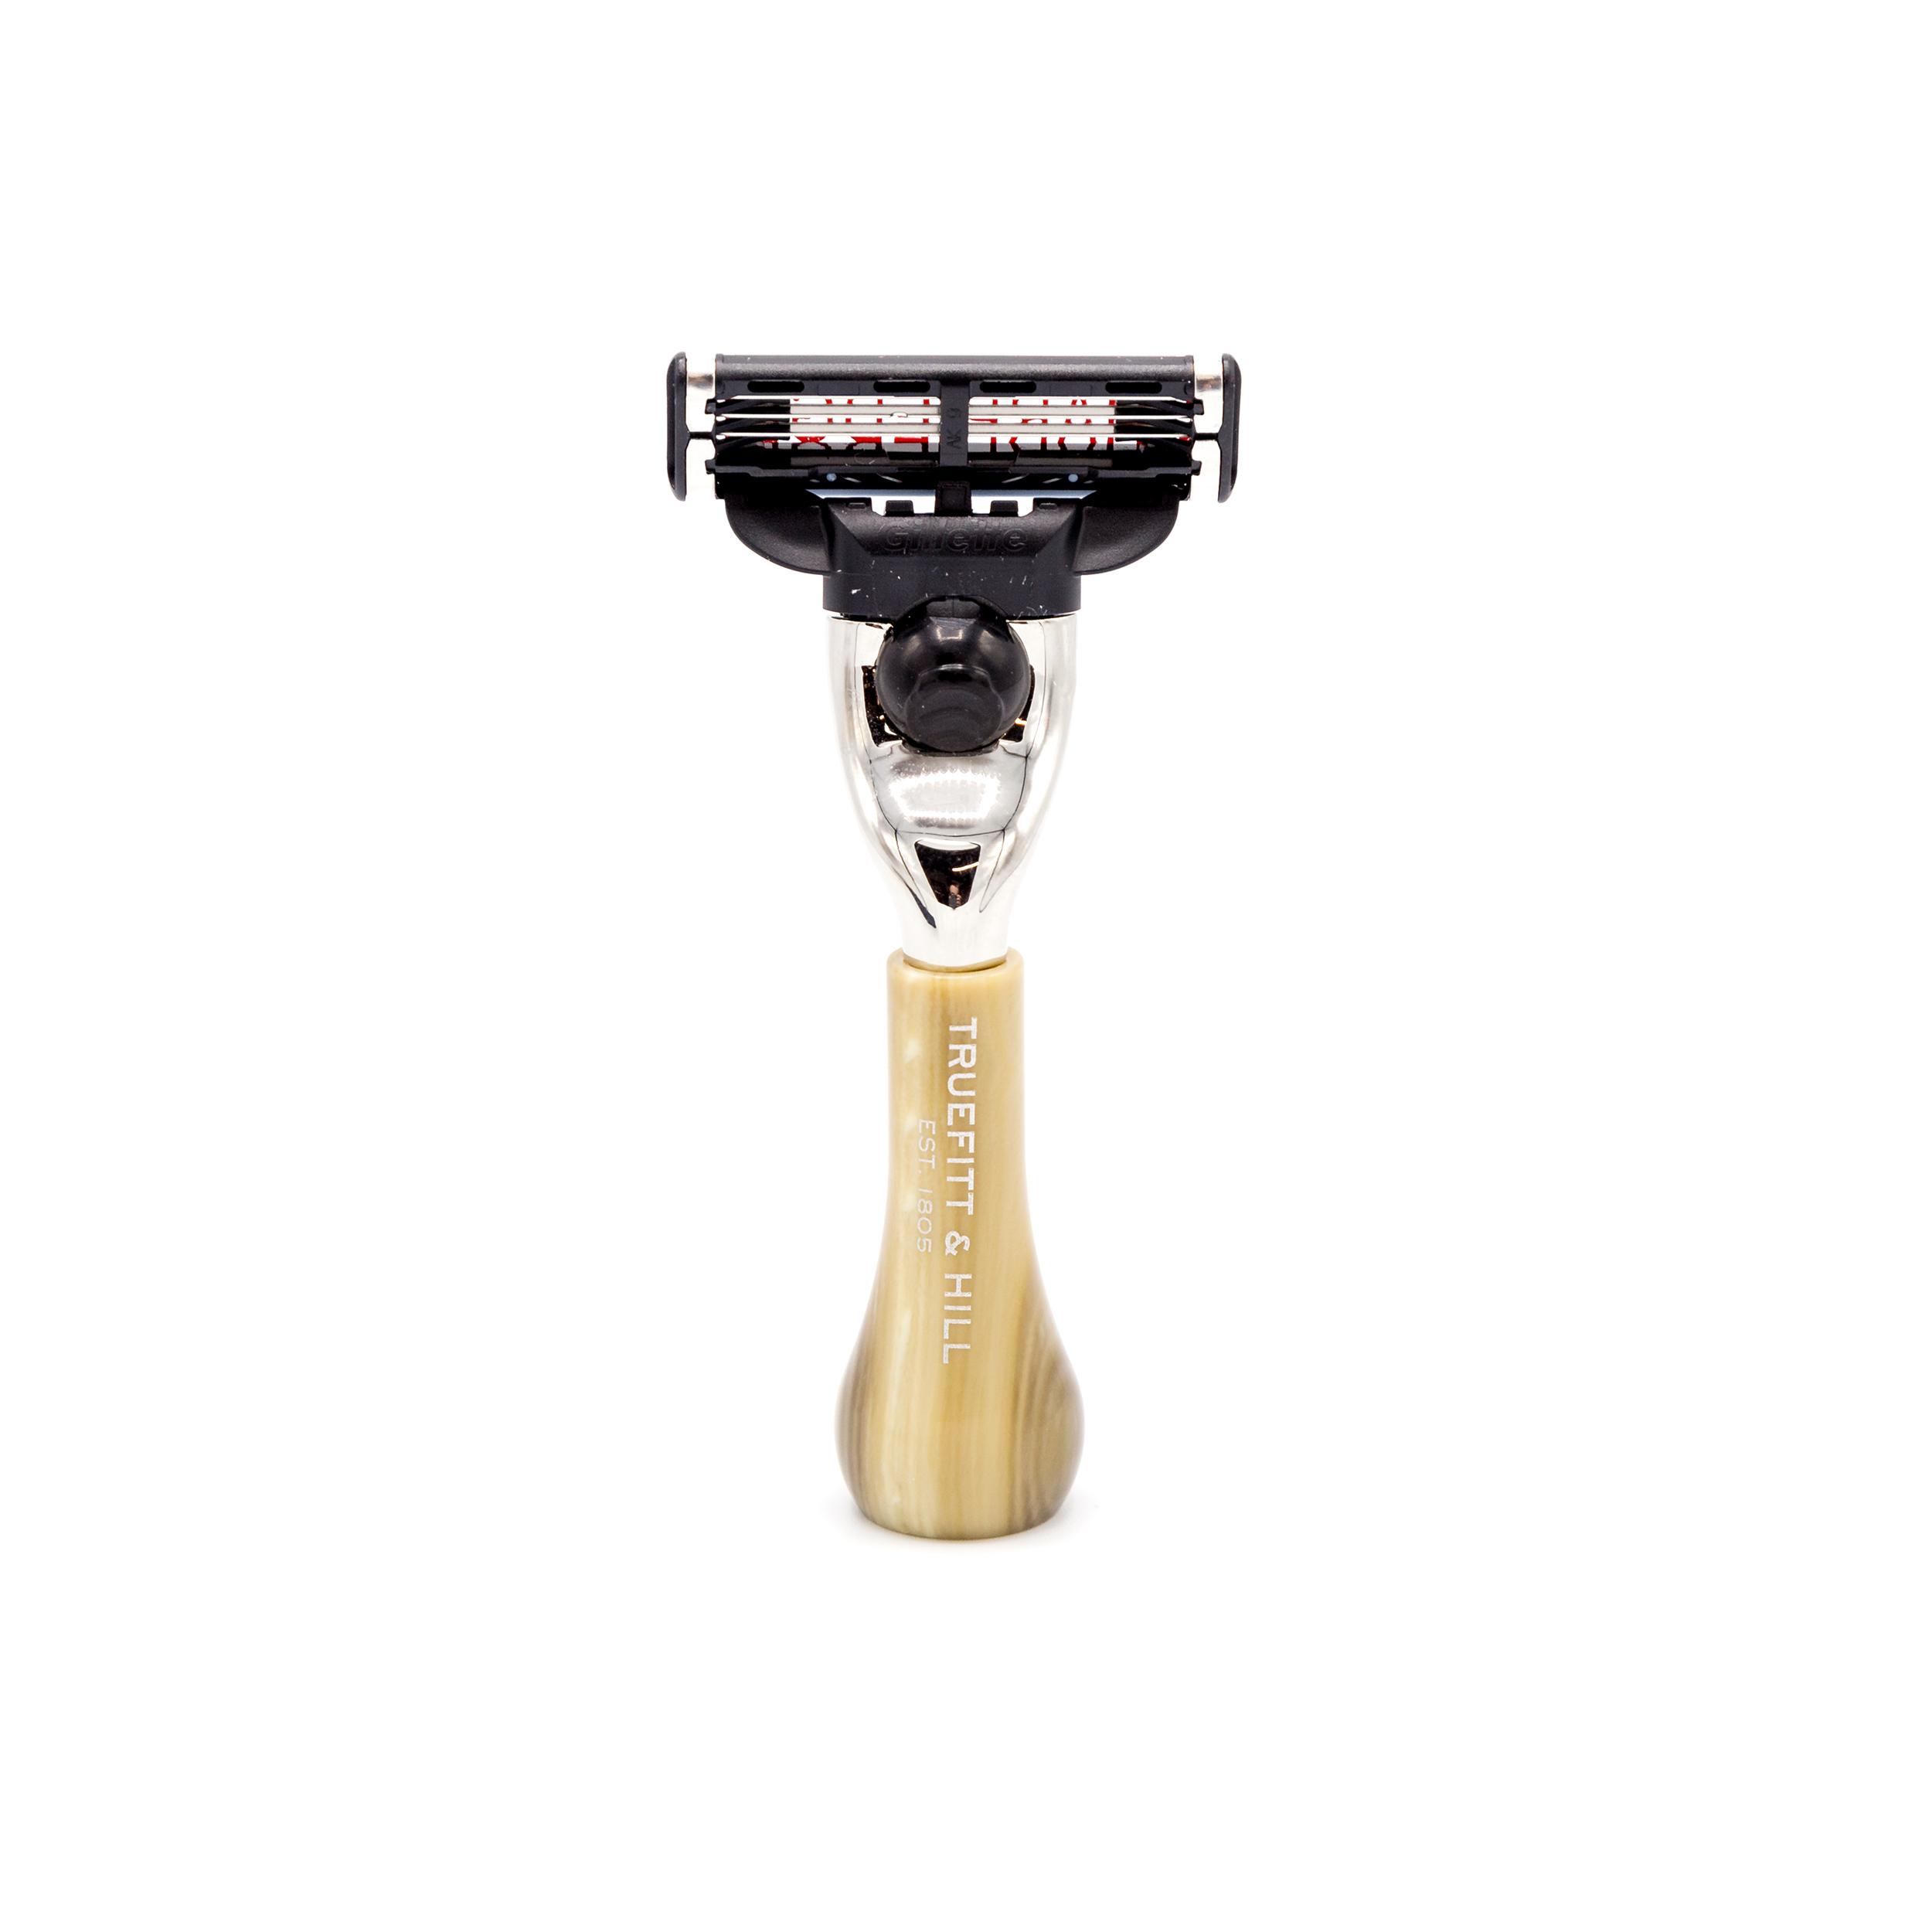 Truefitt & Hill Косметика для бритья и бритвенные аксессуары из Англии - YouTube